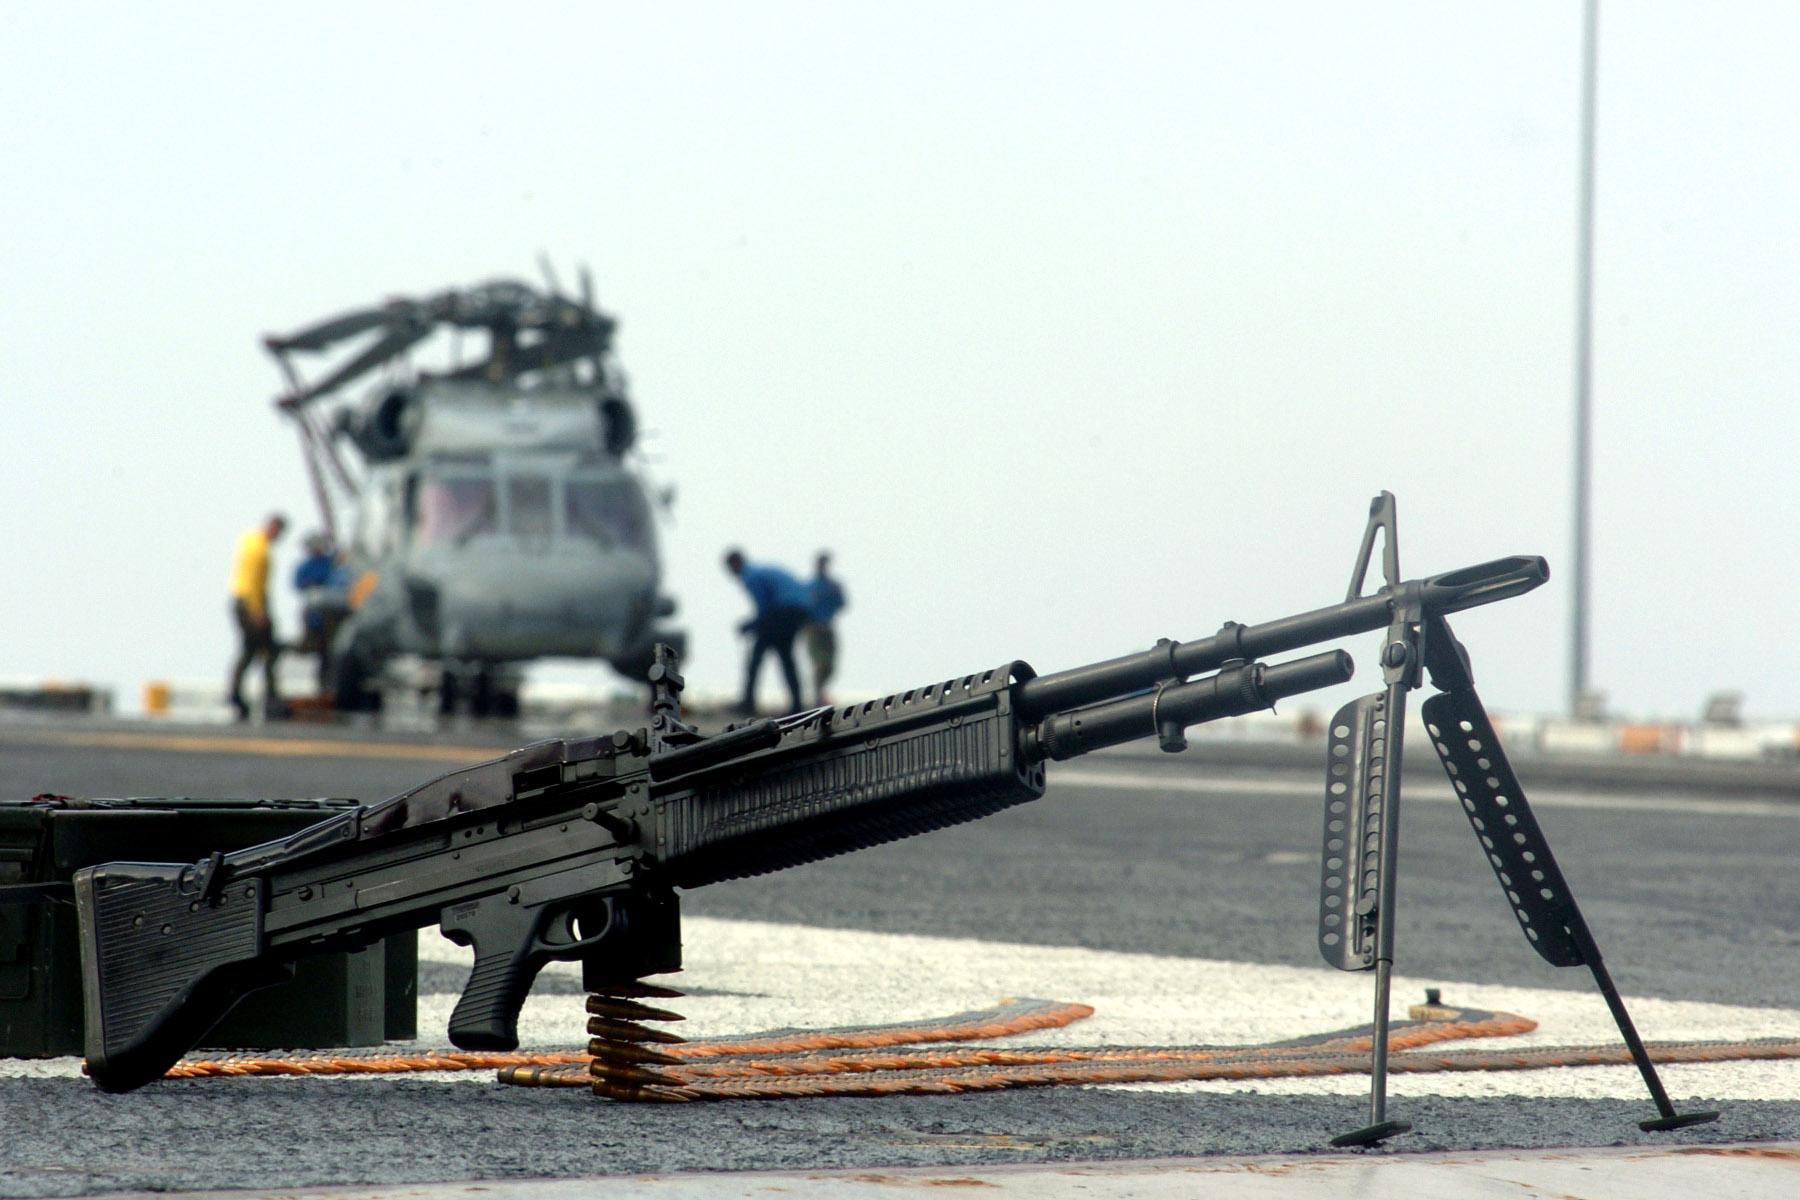 m60 machine gun - photo #18